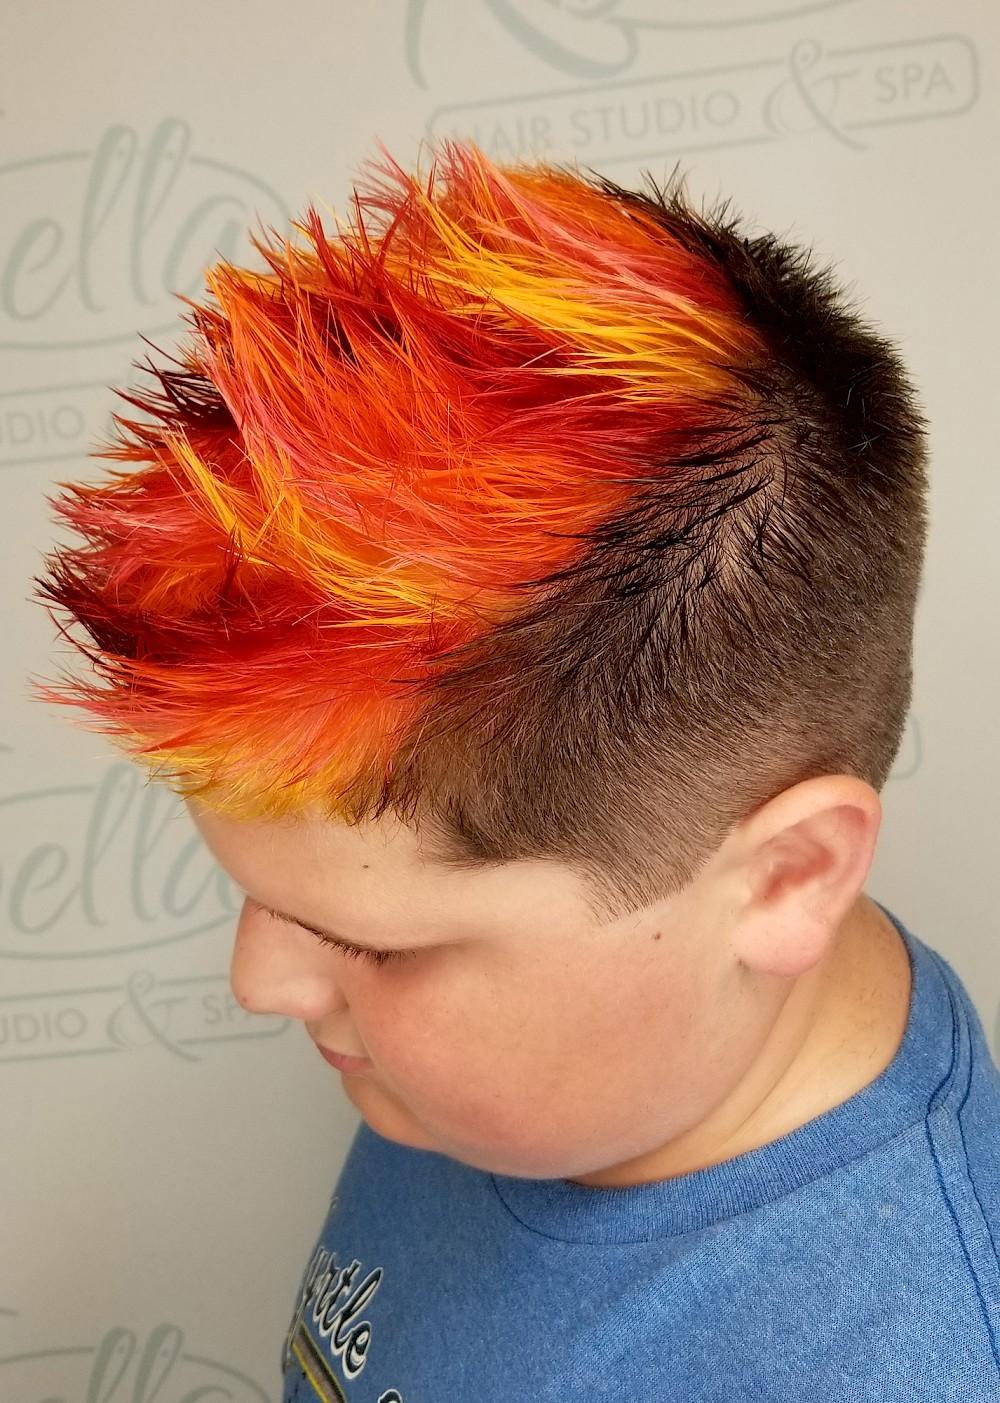 Children S Cut Color Gallery K Bella Hair Studio Spa In Brighton